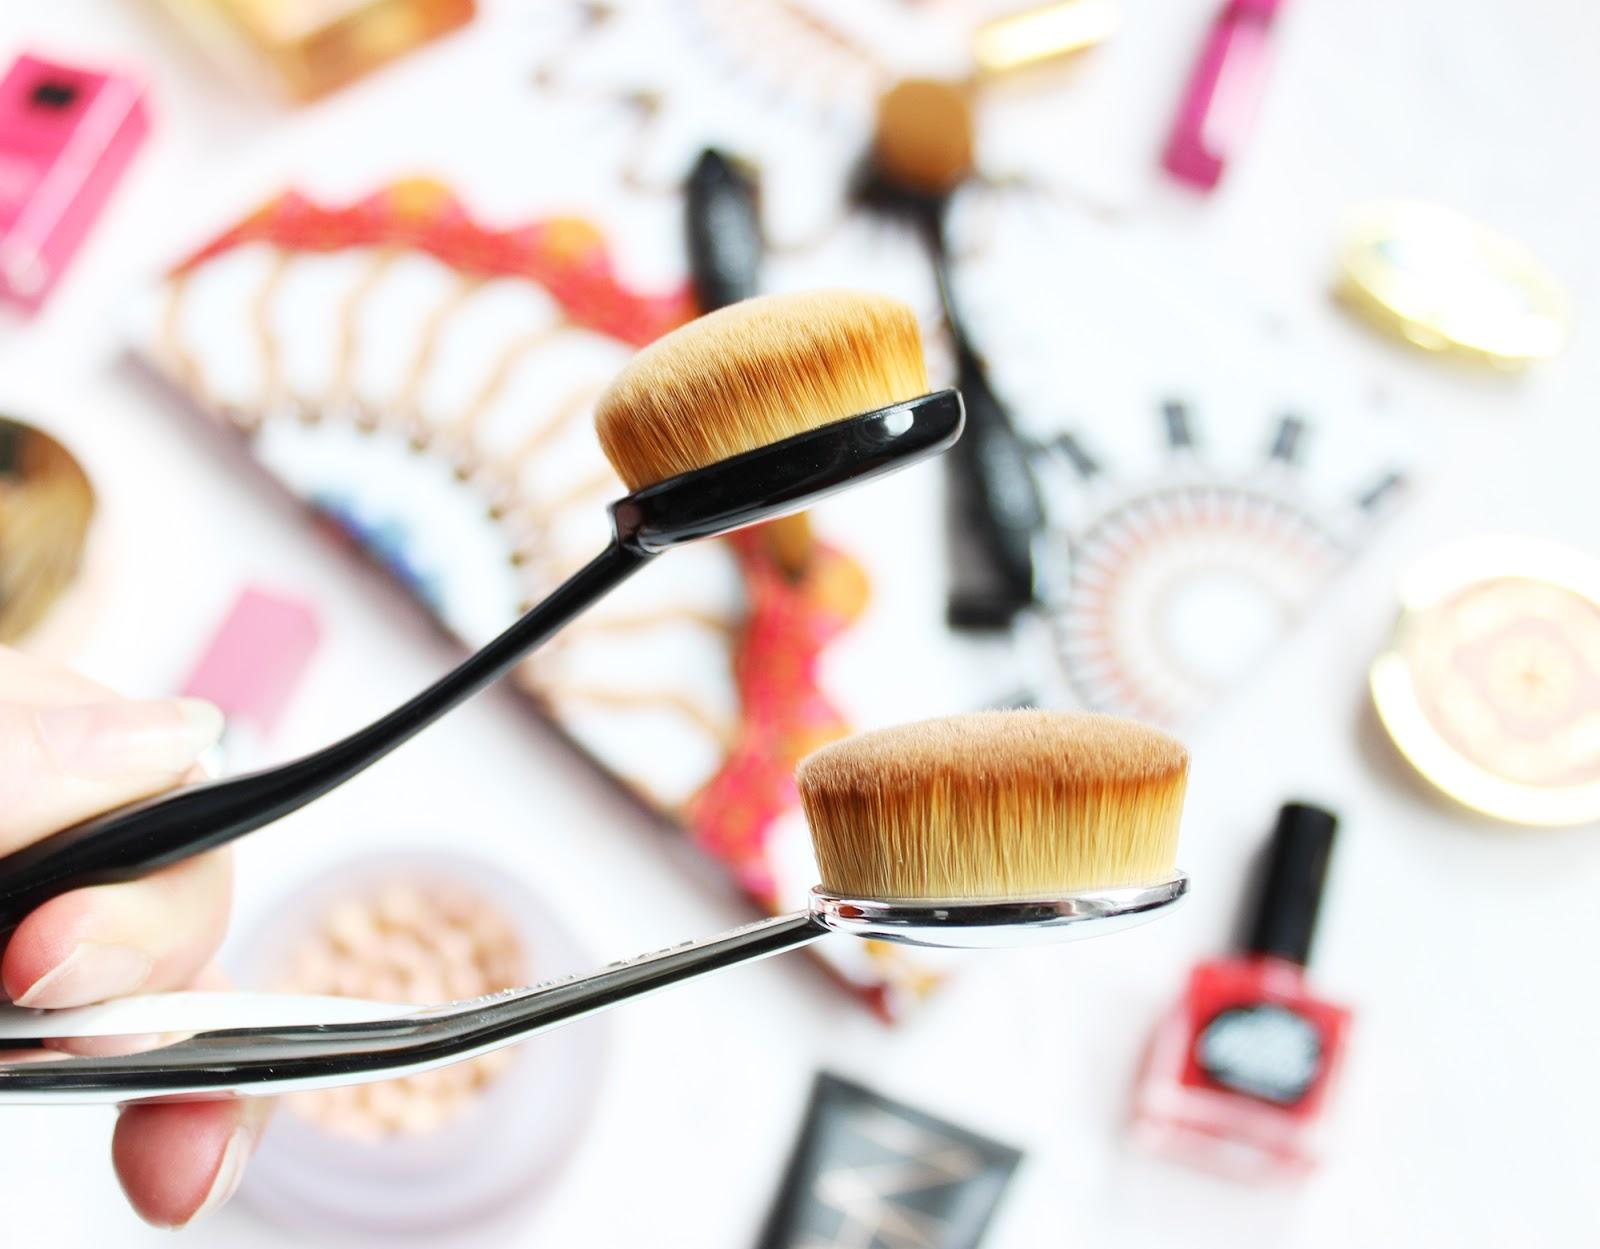 Primark Oval blending brushes Artis Dupe - review